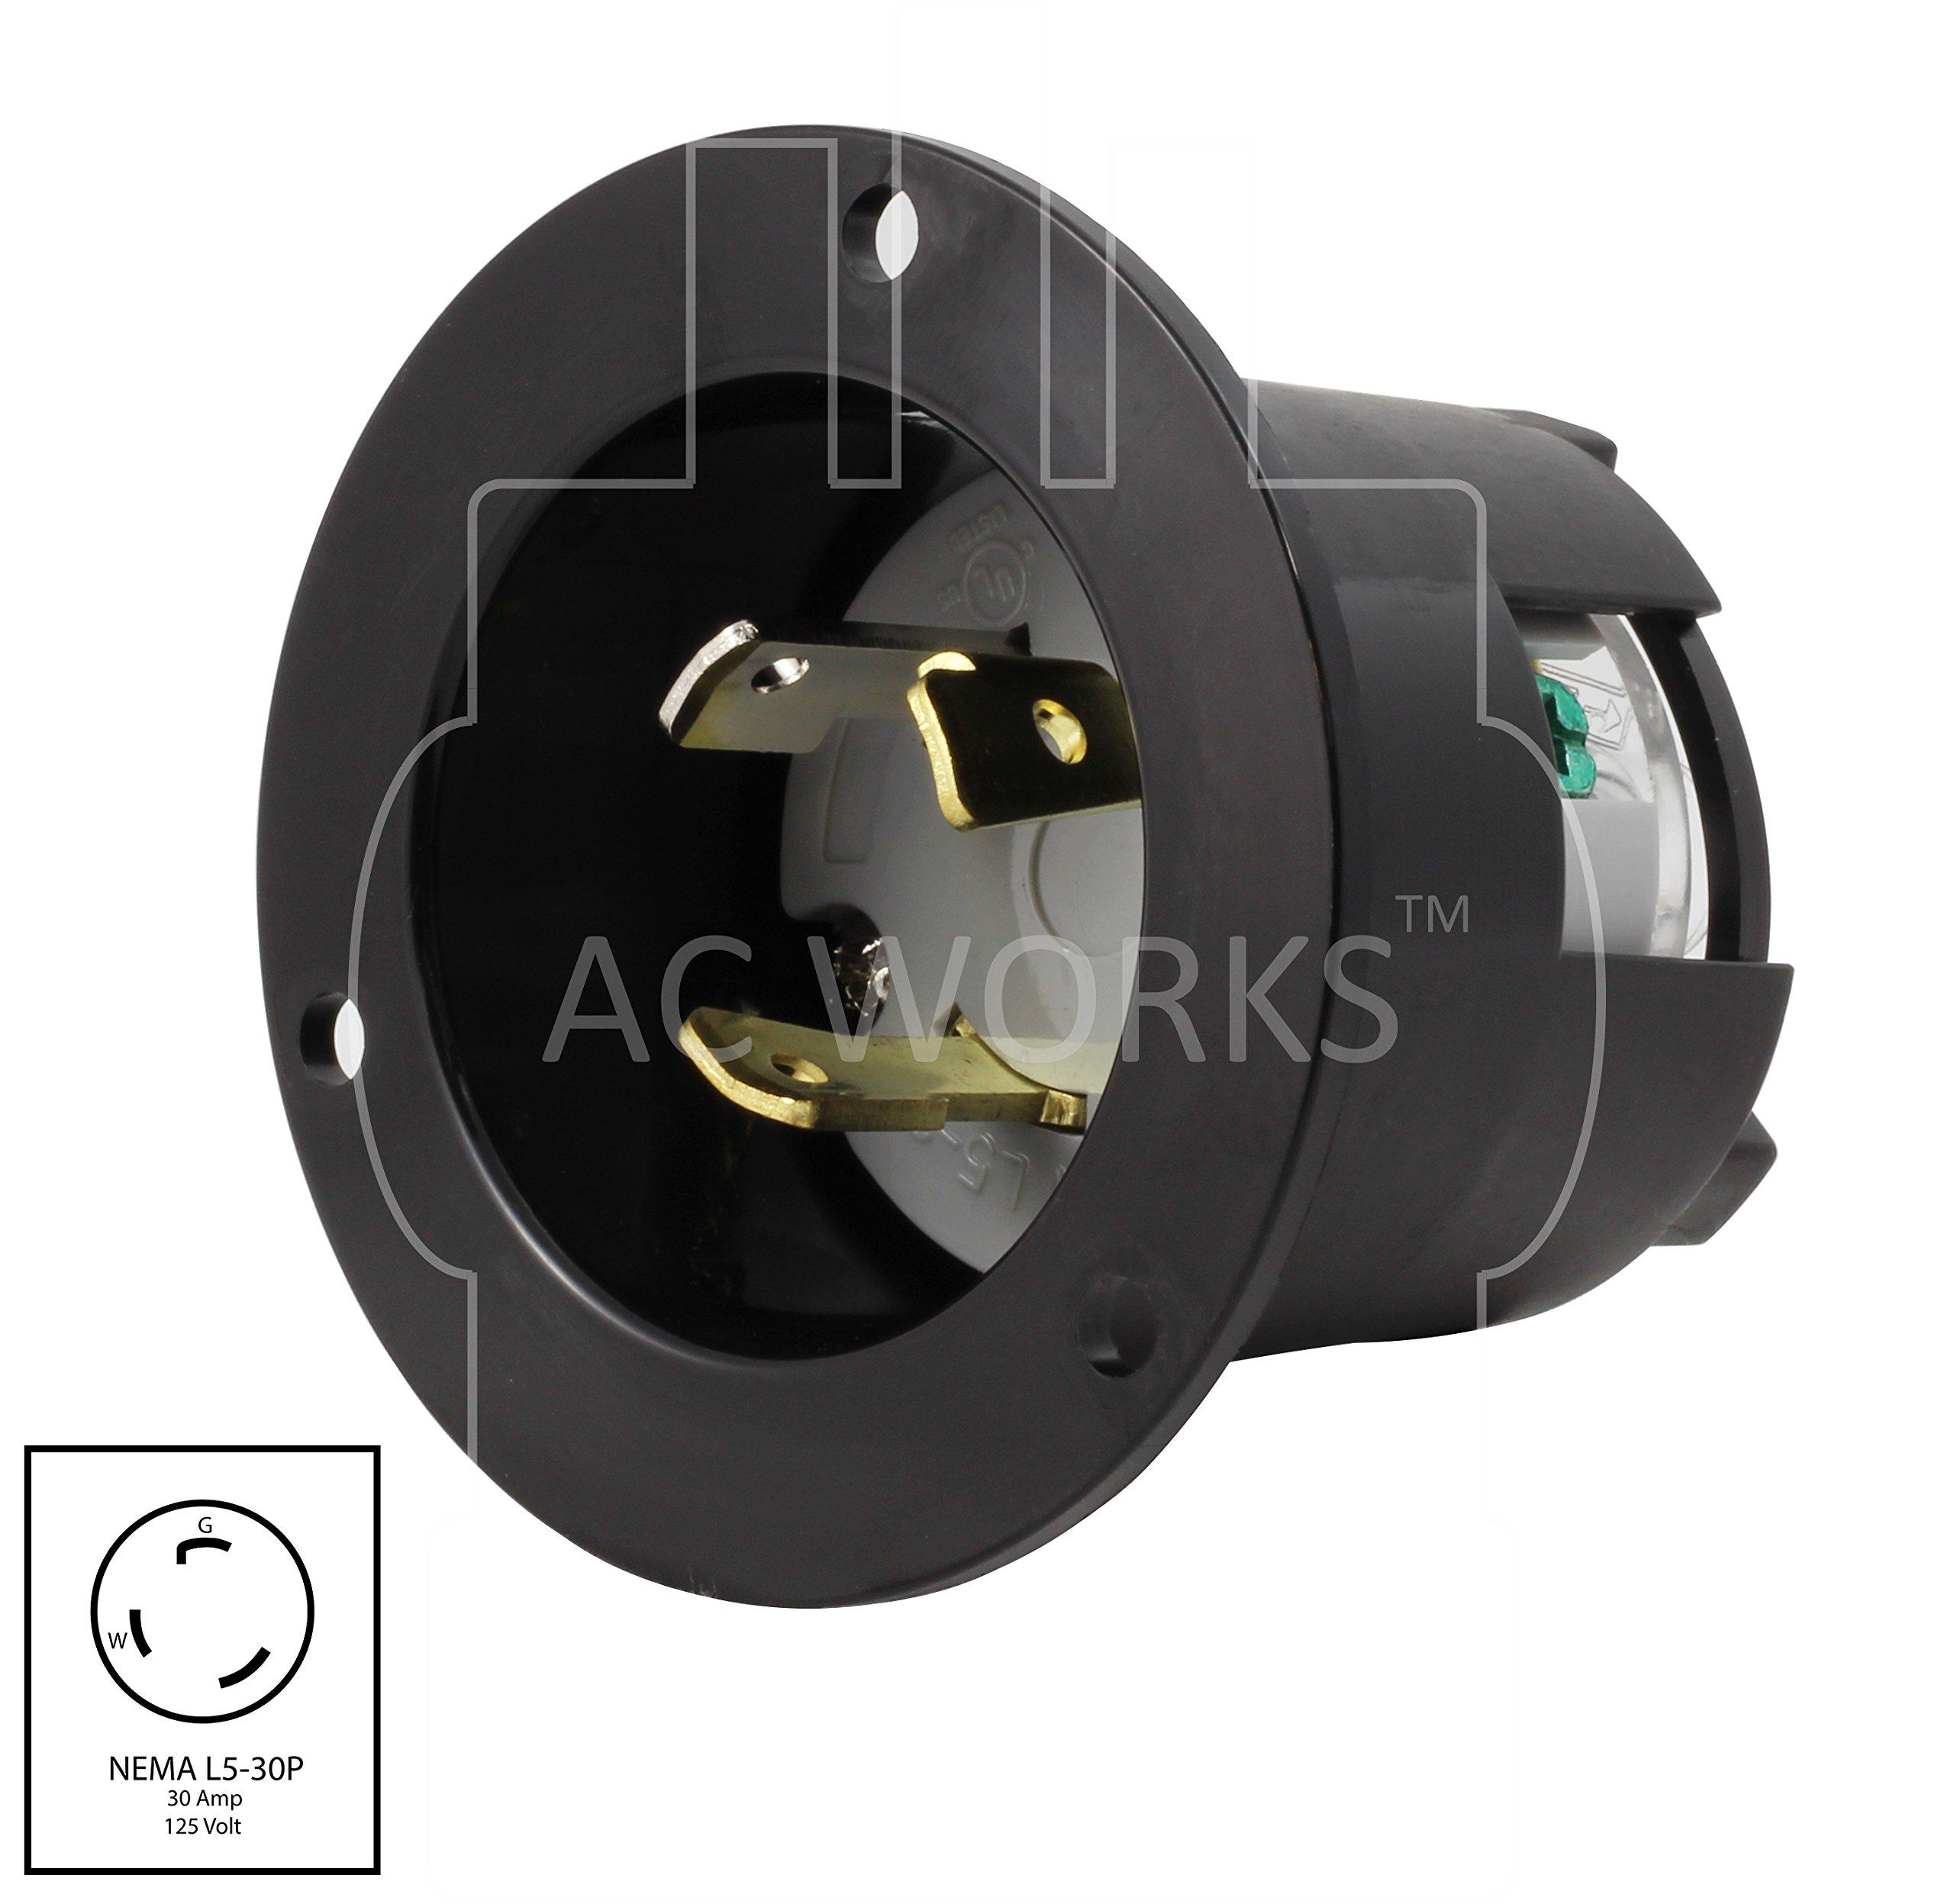 AC WORKS ASINL530P 30-Amp 125-Volt NEMA L5-30P Flanged Power Input Inlet by AC WORKS (Image #1)